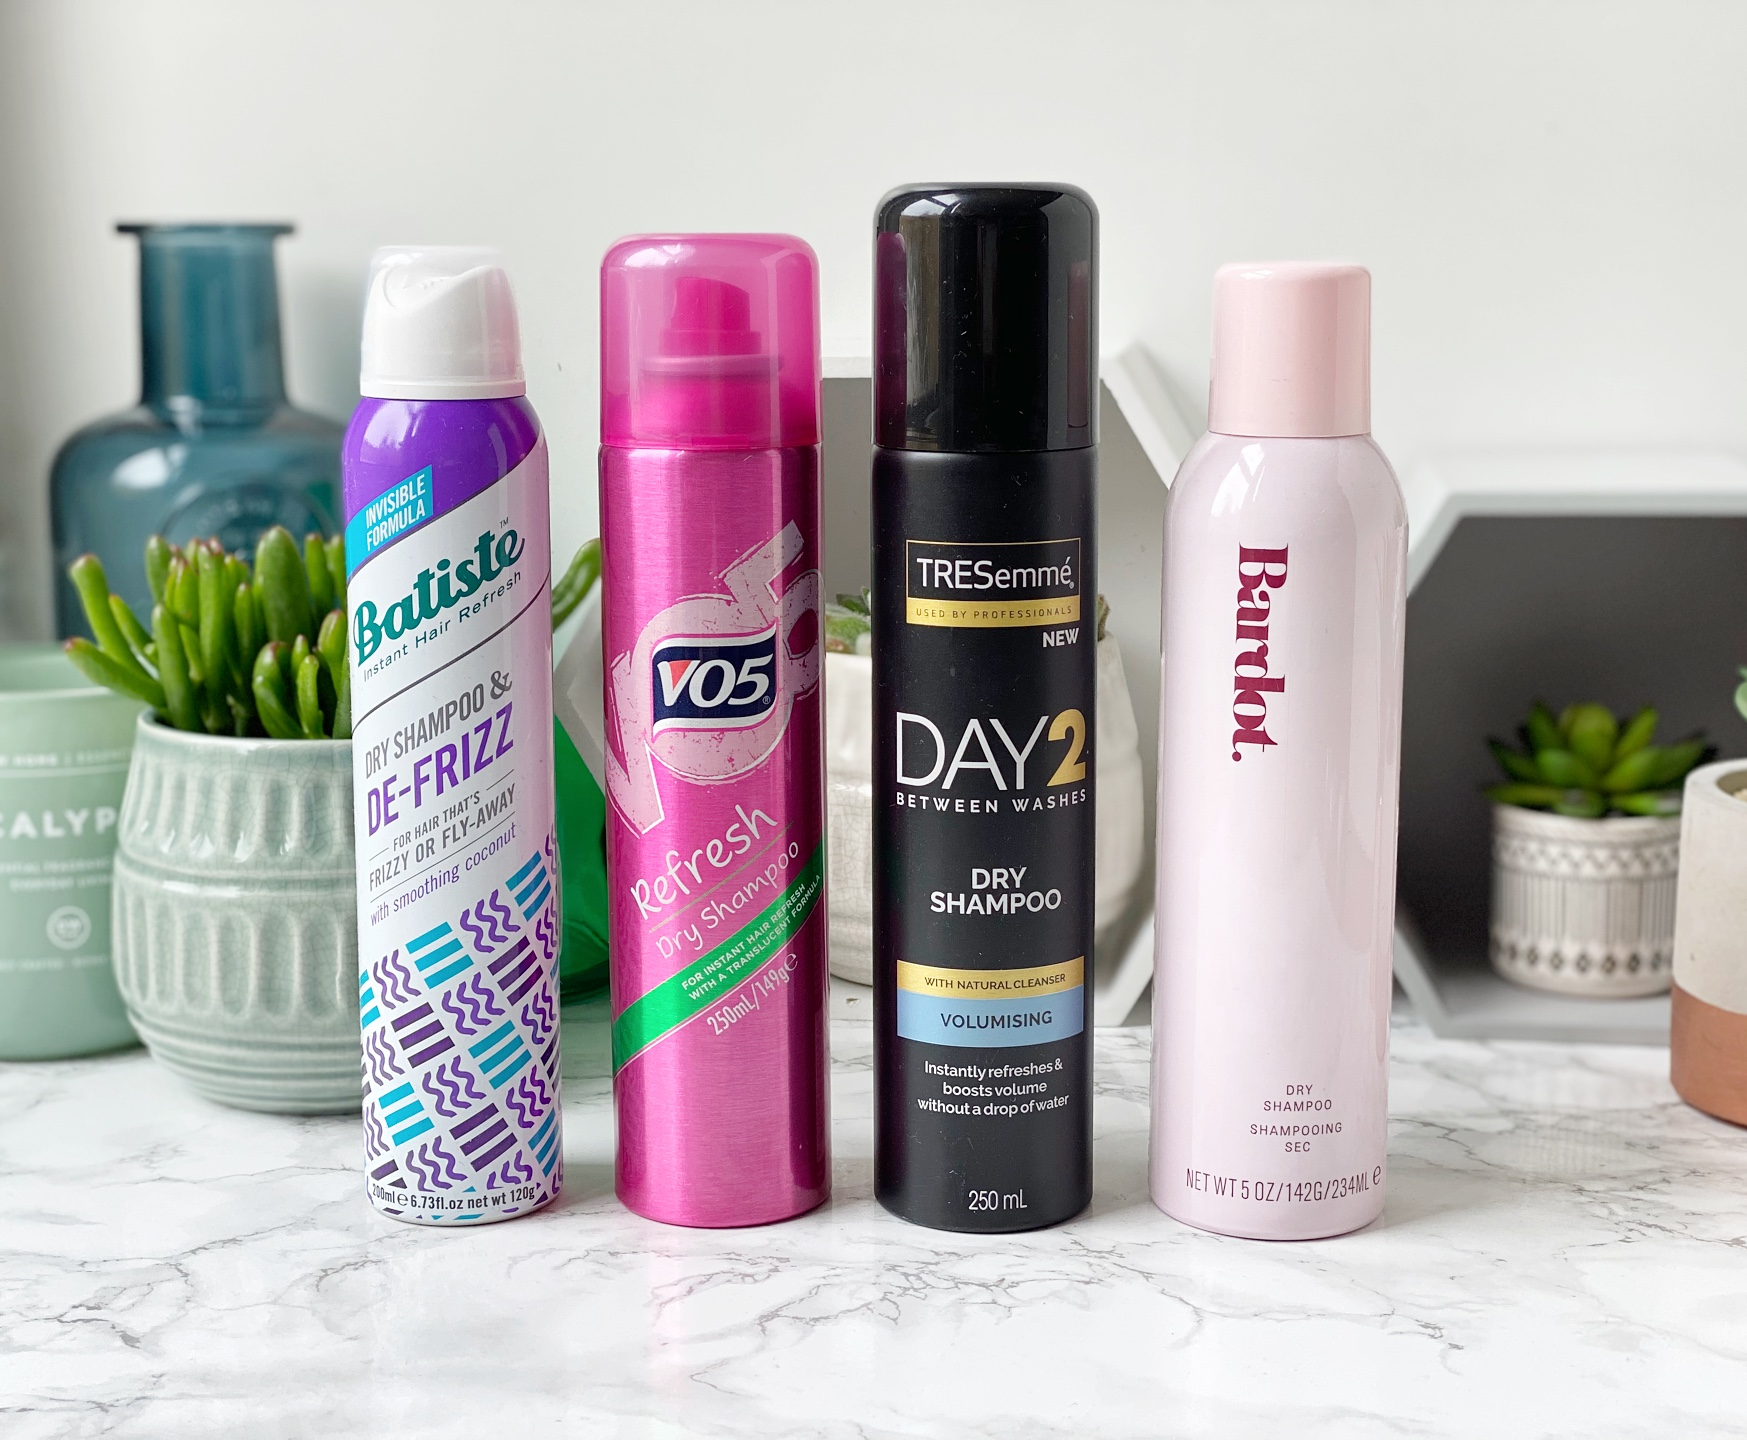 dry shampoo review batiste vo5 tresemme Bardot